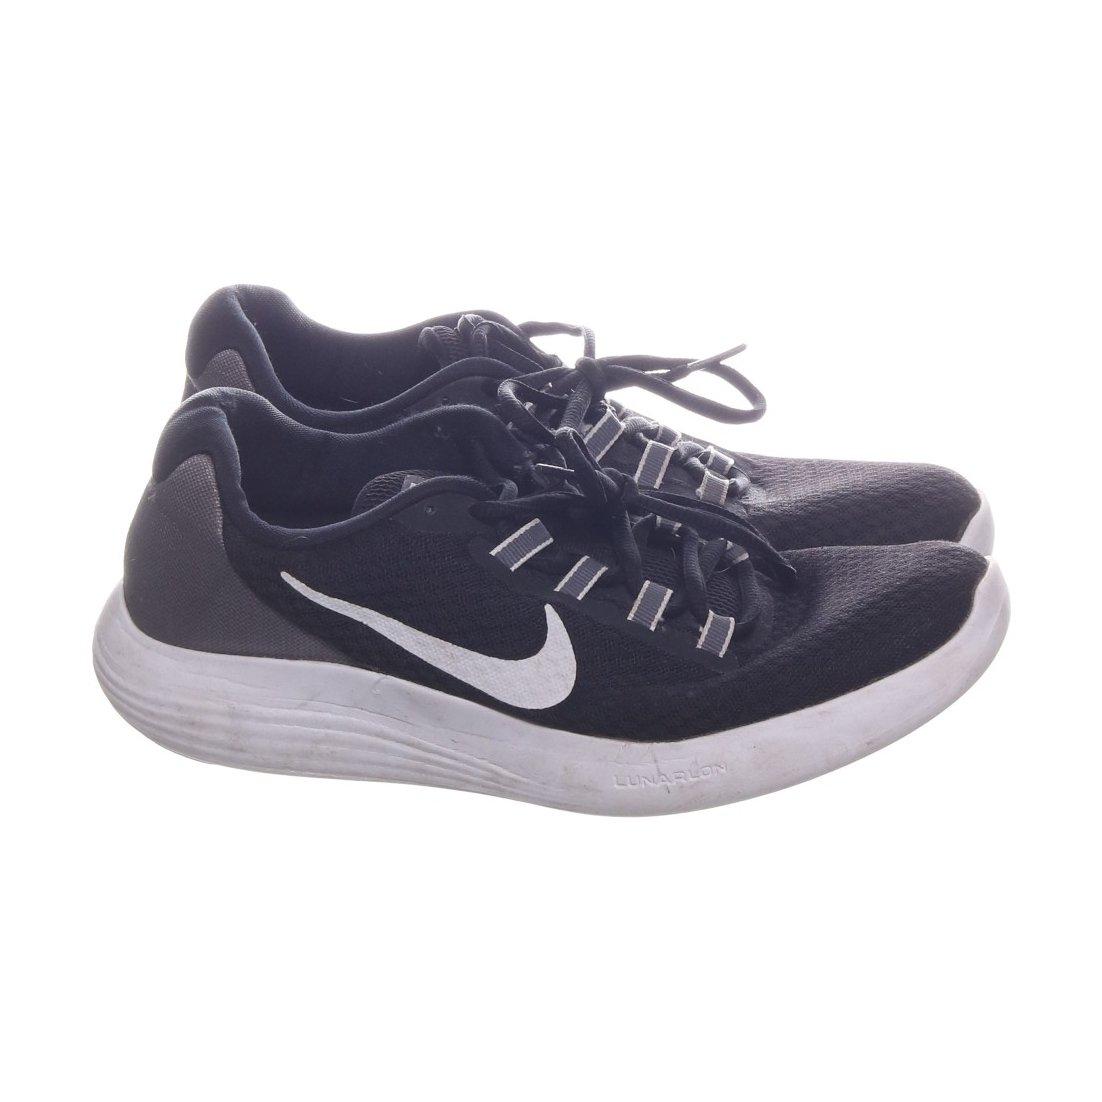 Nike, Tr?ningsskor, Strl: 40, Svart